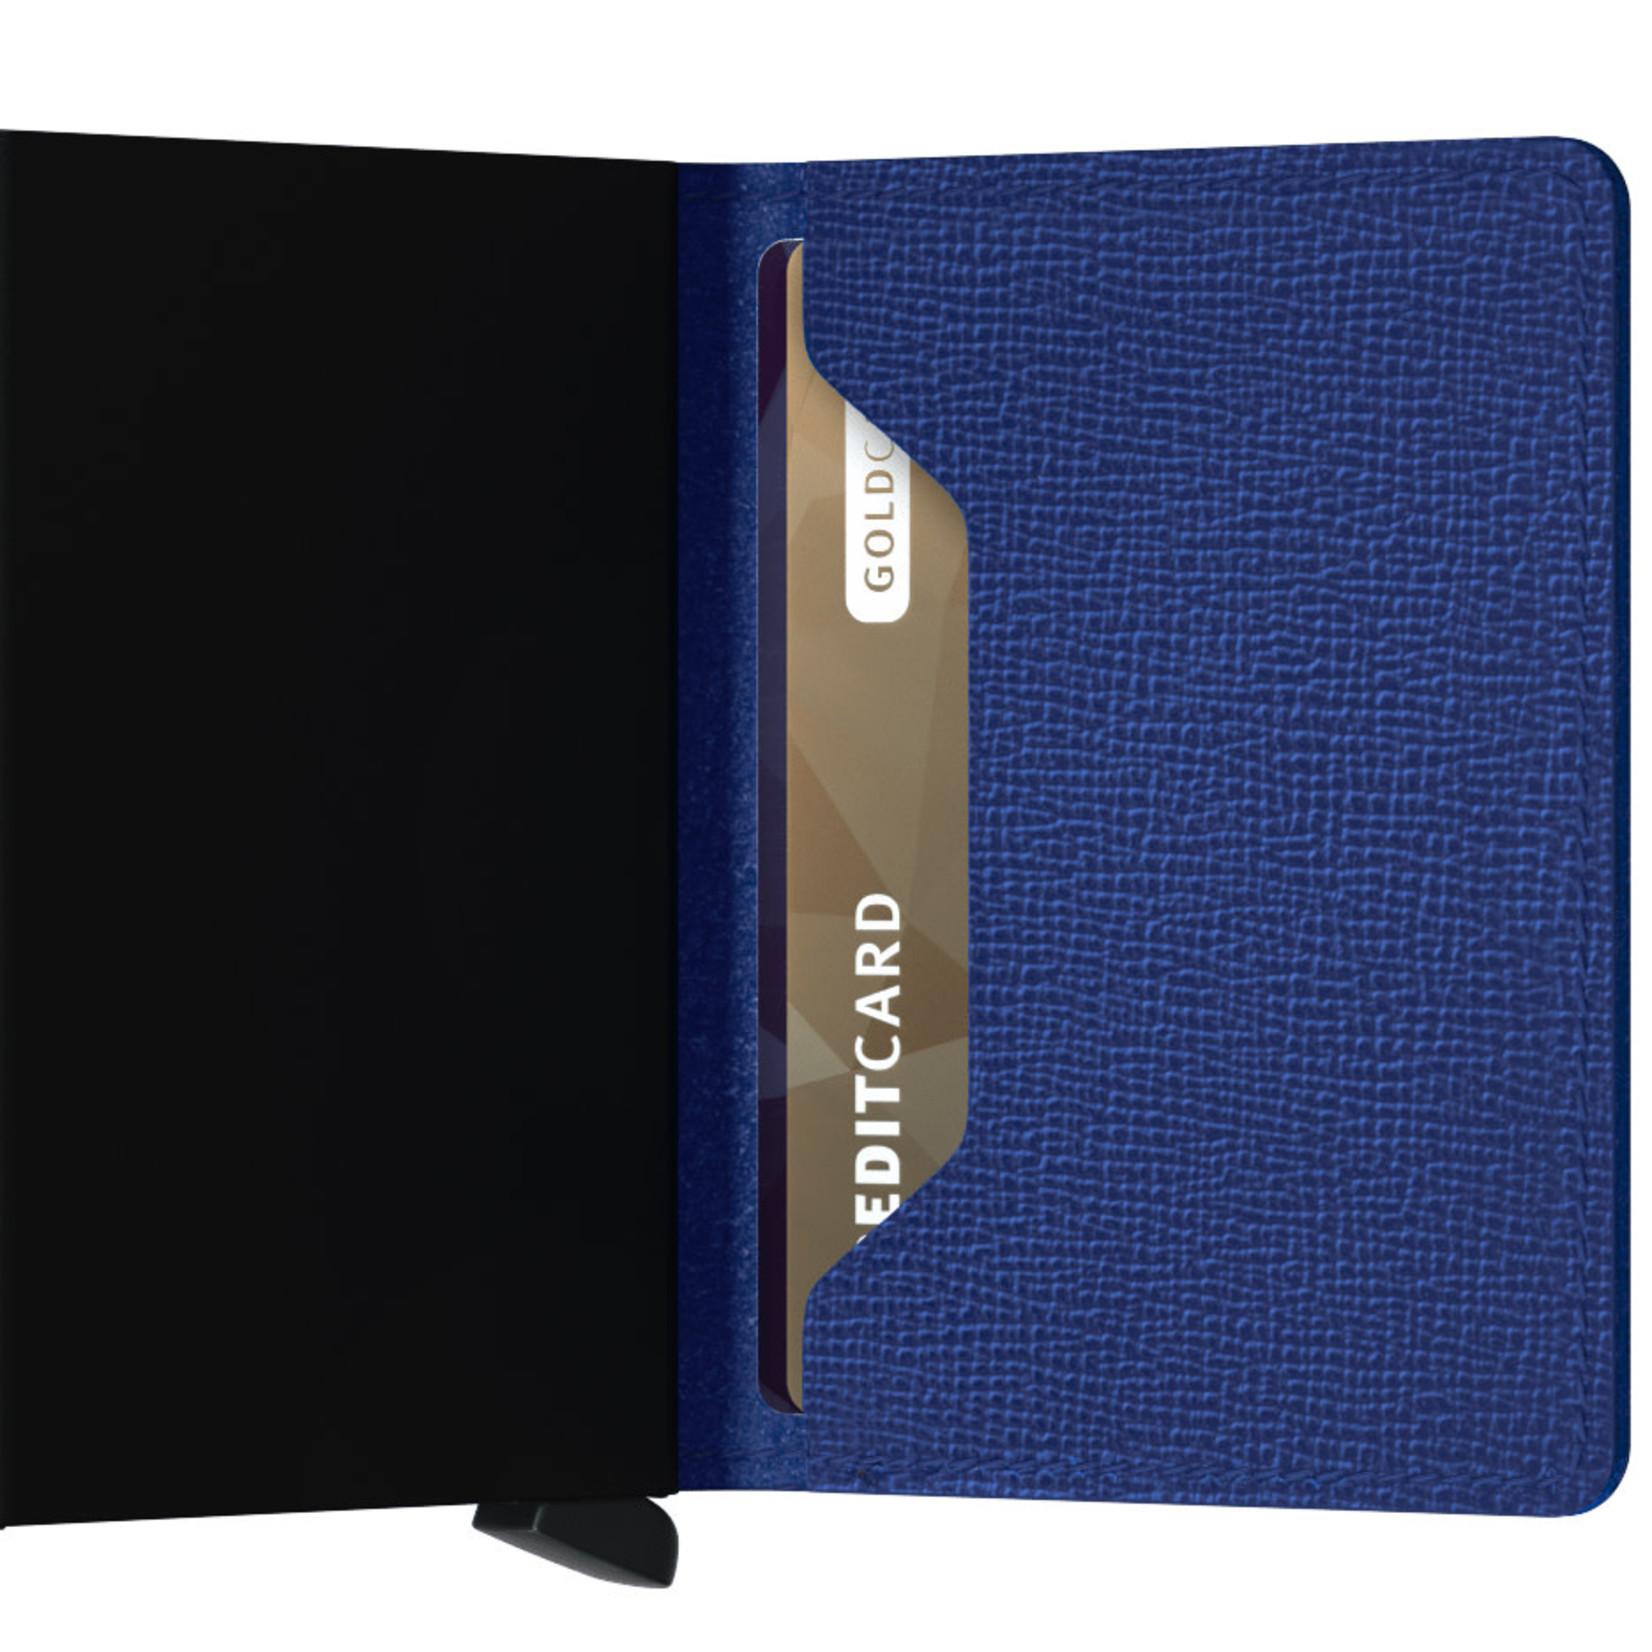 SECRID Secrid Slimwallet Crisple Blue